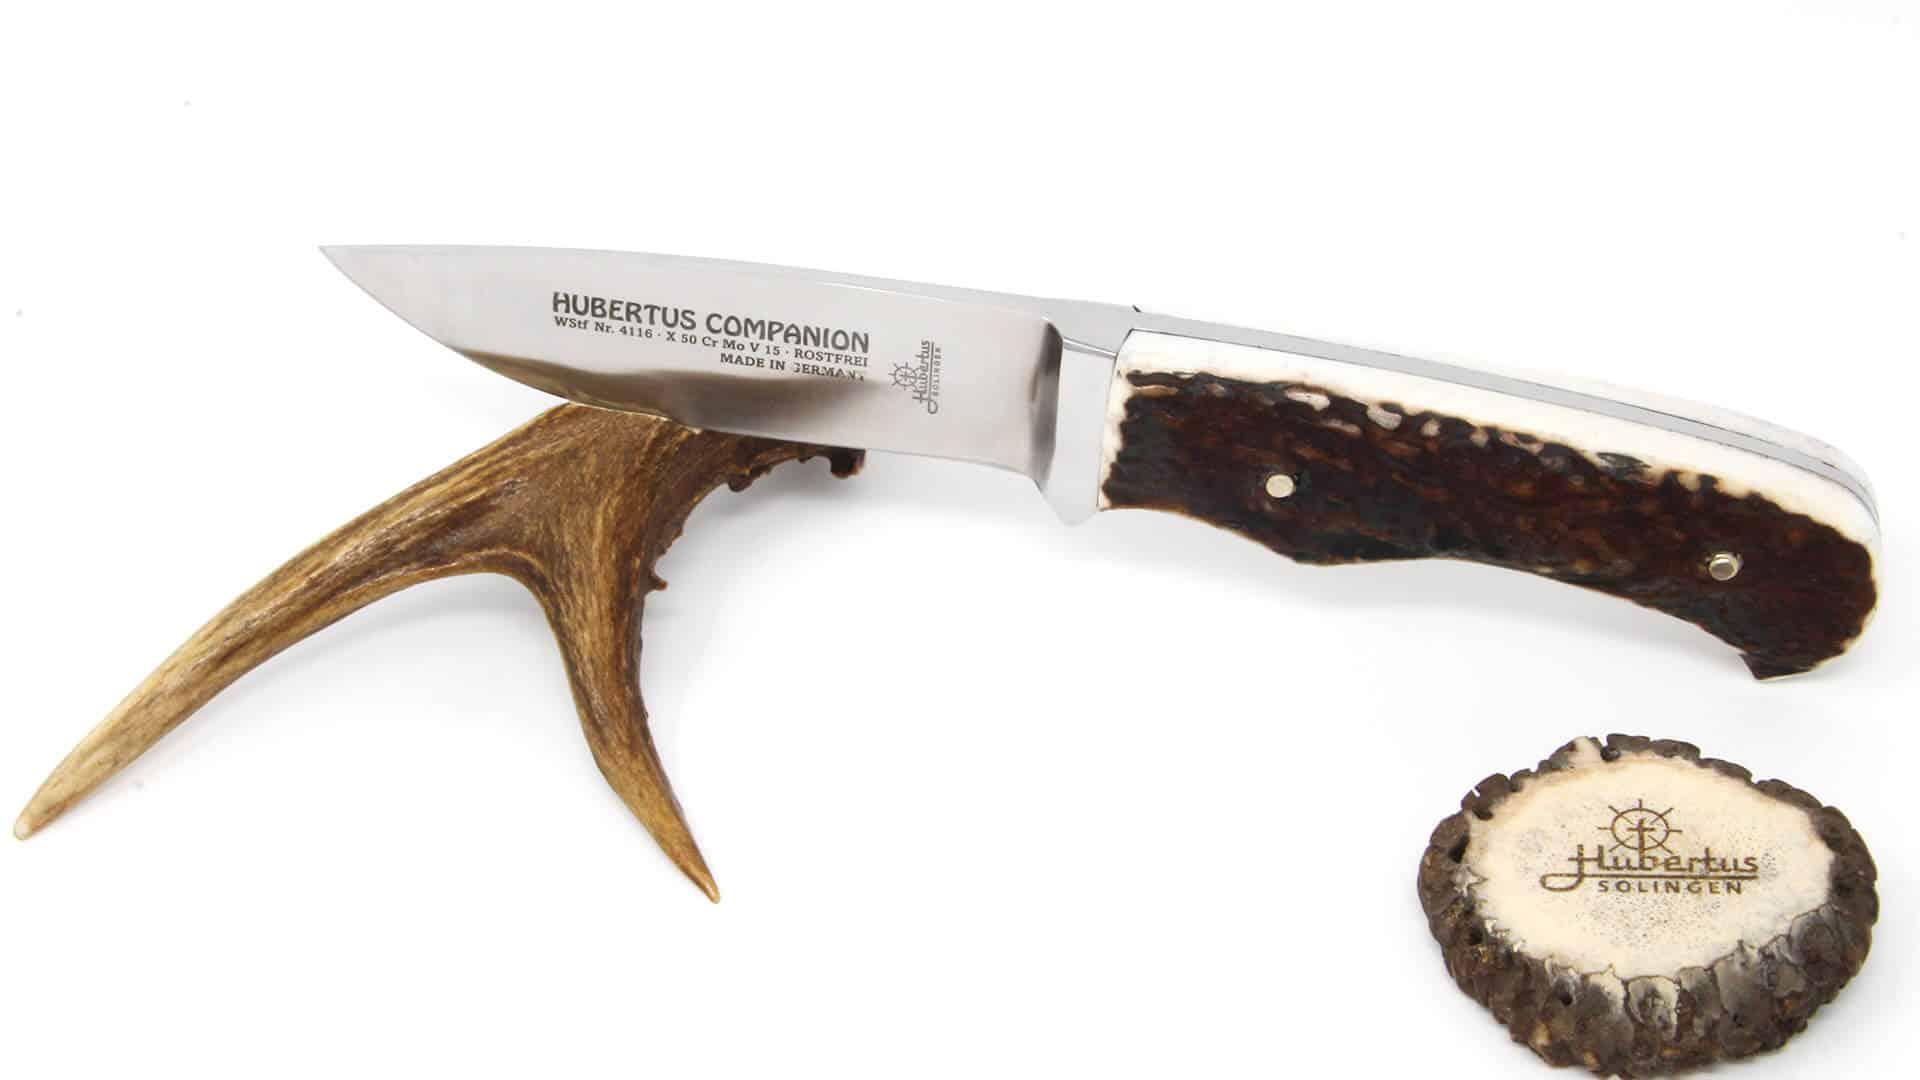 Hubertus Companion kaufen bei Messervertrieb Rottner